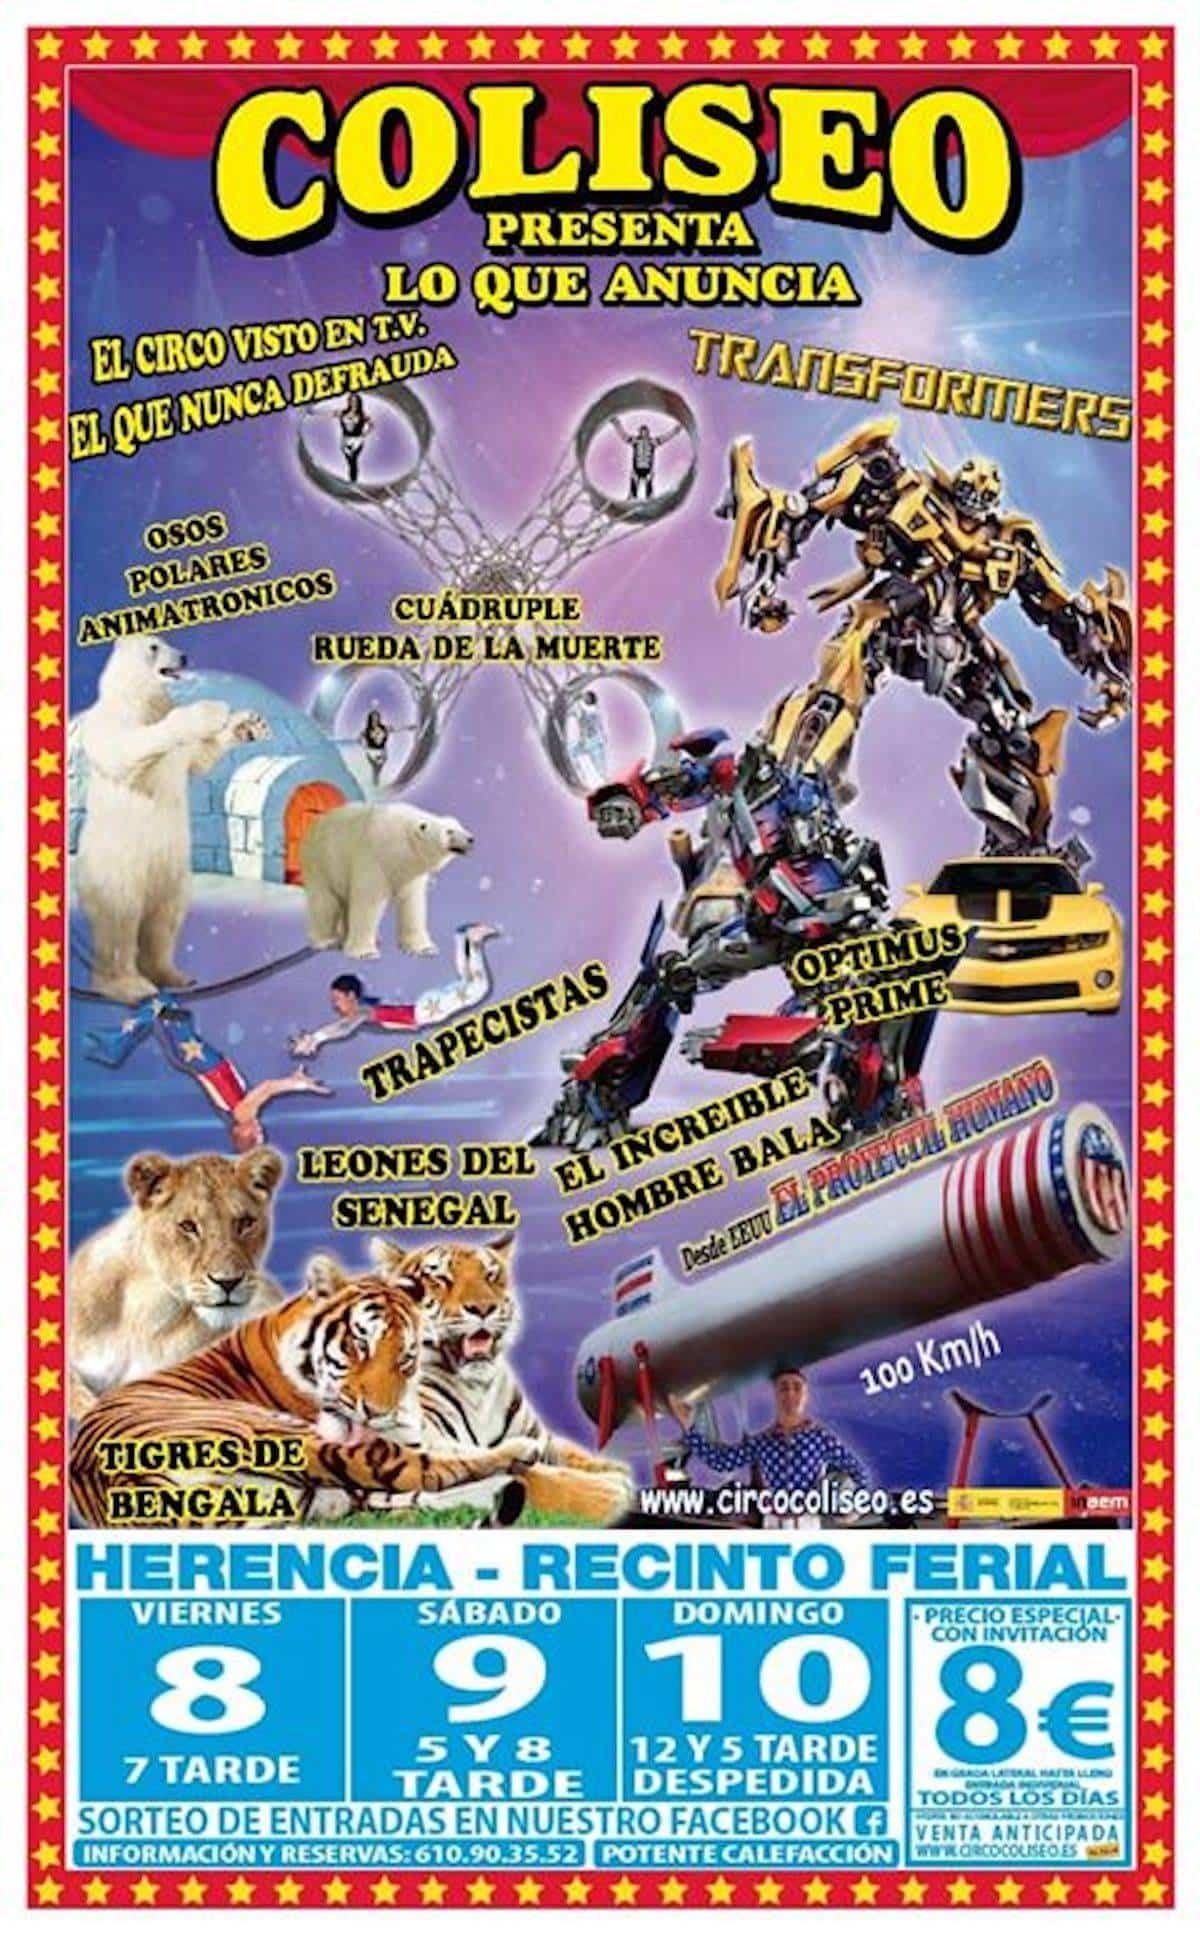 circo coliseo herencia 2 - El Circo Coliseo llega a Herencia después de Carnaval